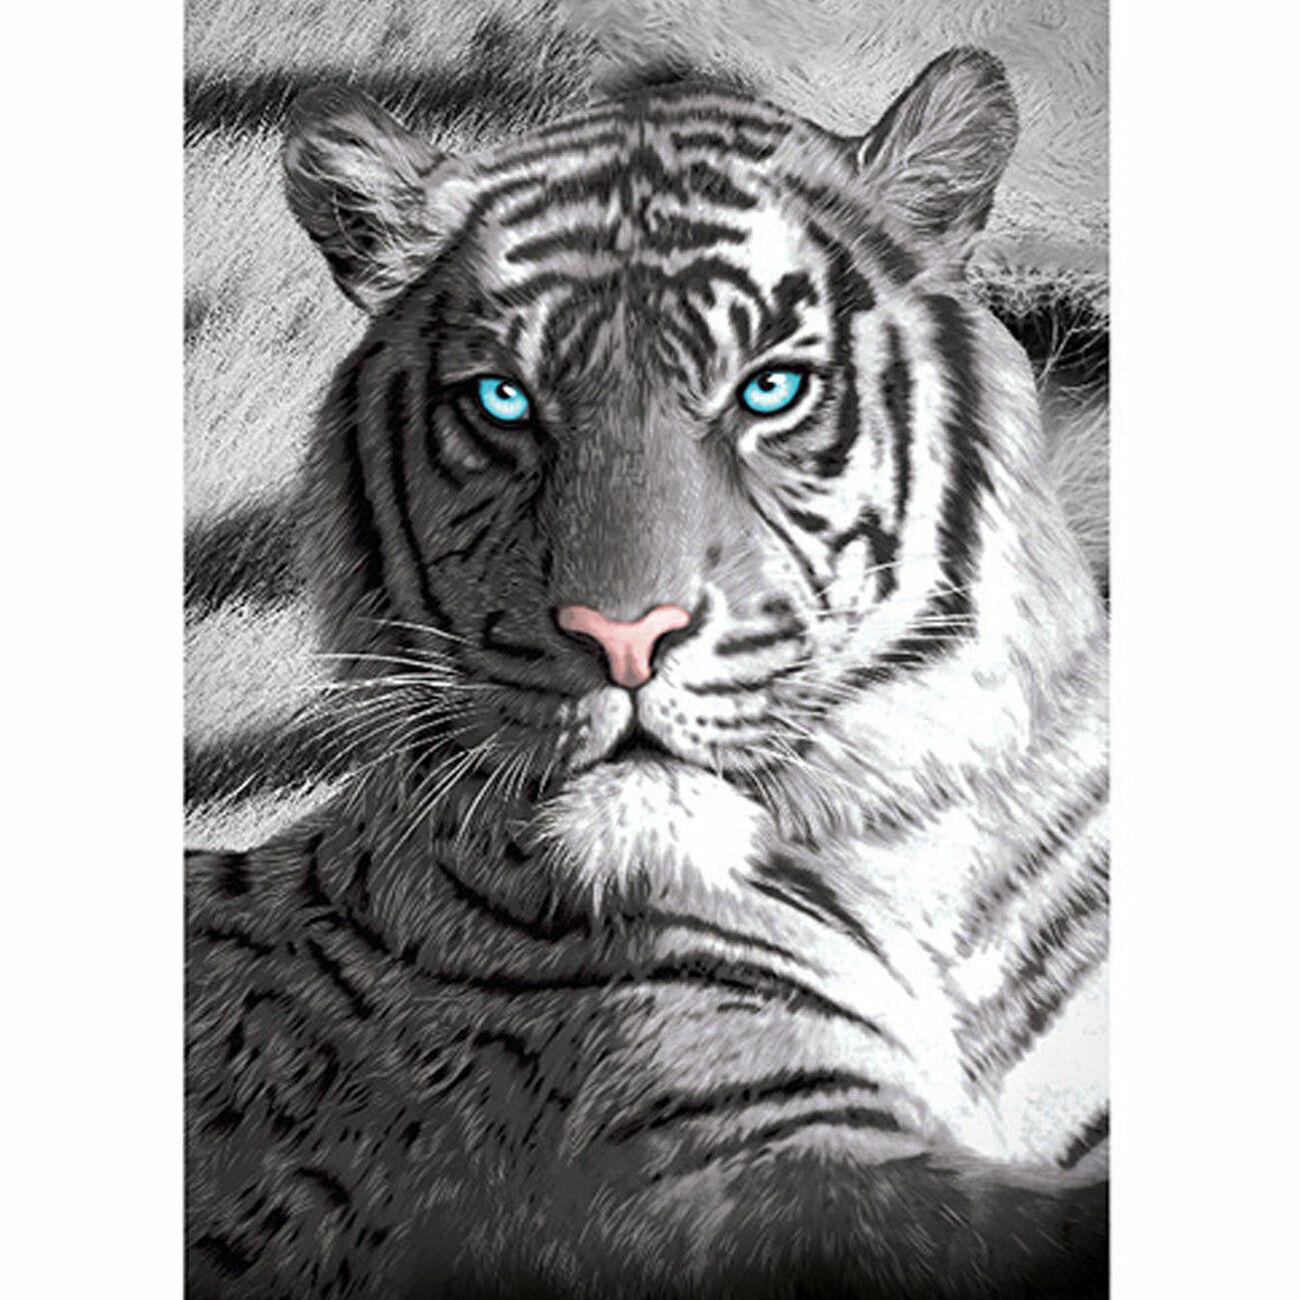 Blue Eyes Tiger Beach Pool Bath Towel | 100% Cotton | Animal Photographic print